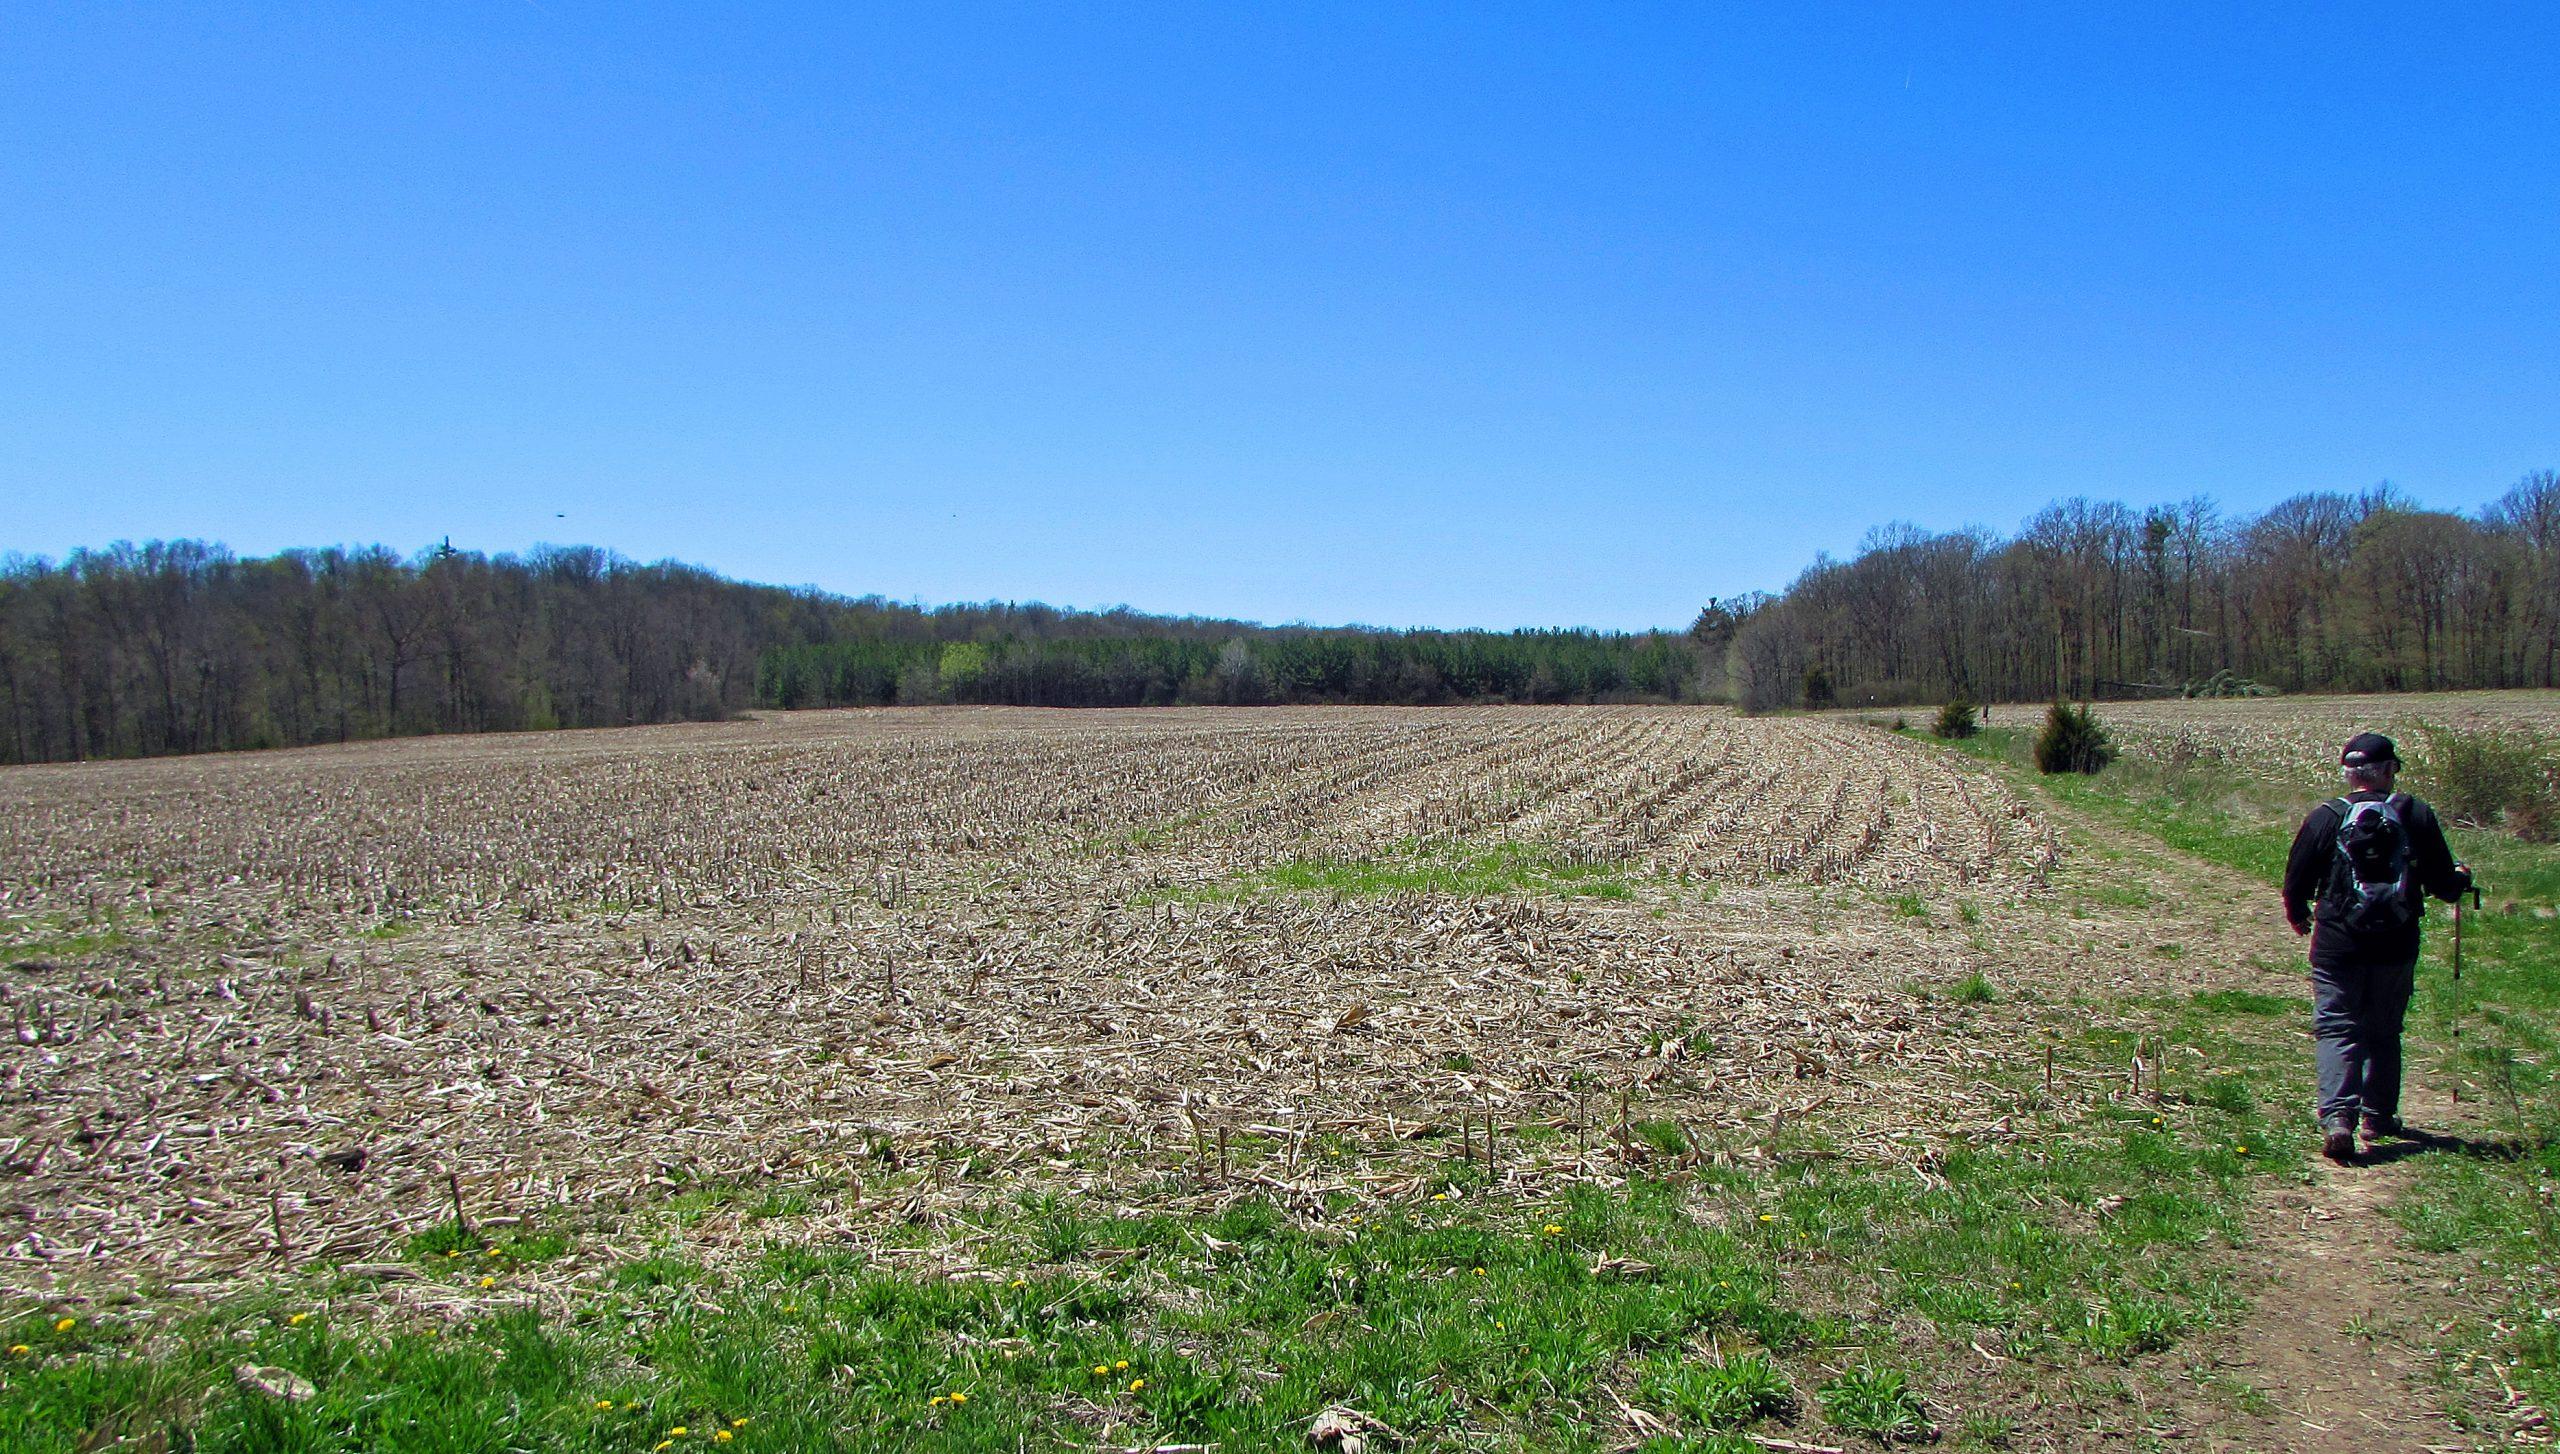 Bruce Trail End To End Part 4 – Holmström Ruddick Intended For Walnut Hills High School Spring Break